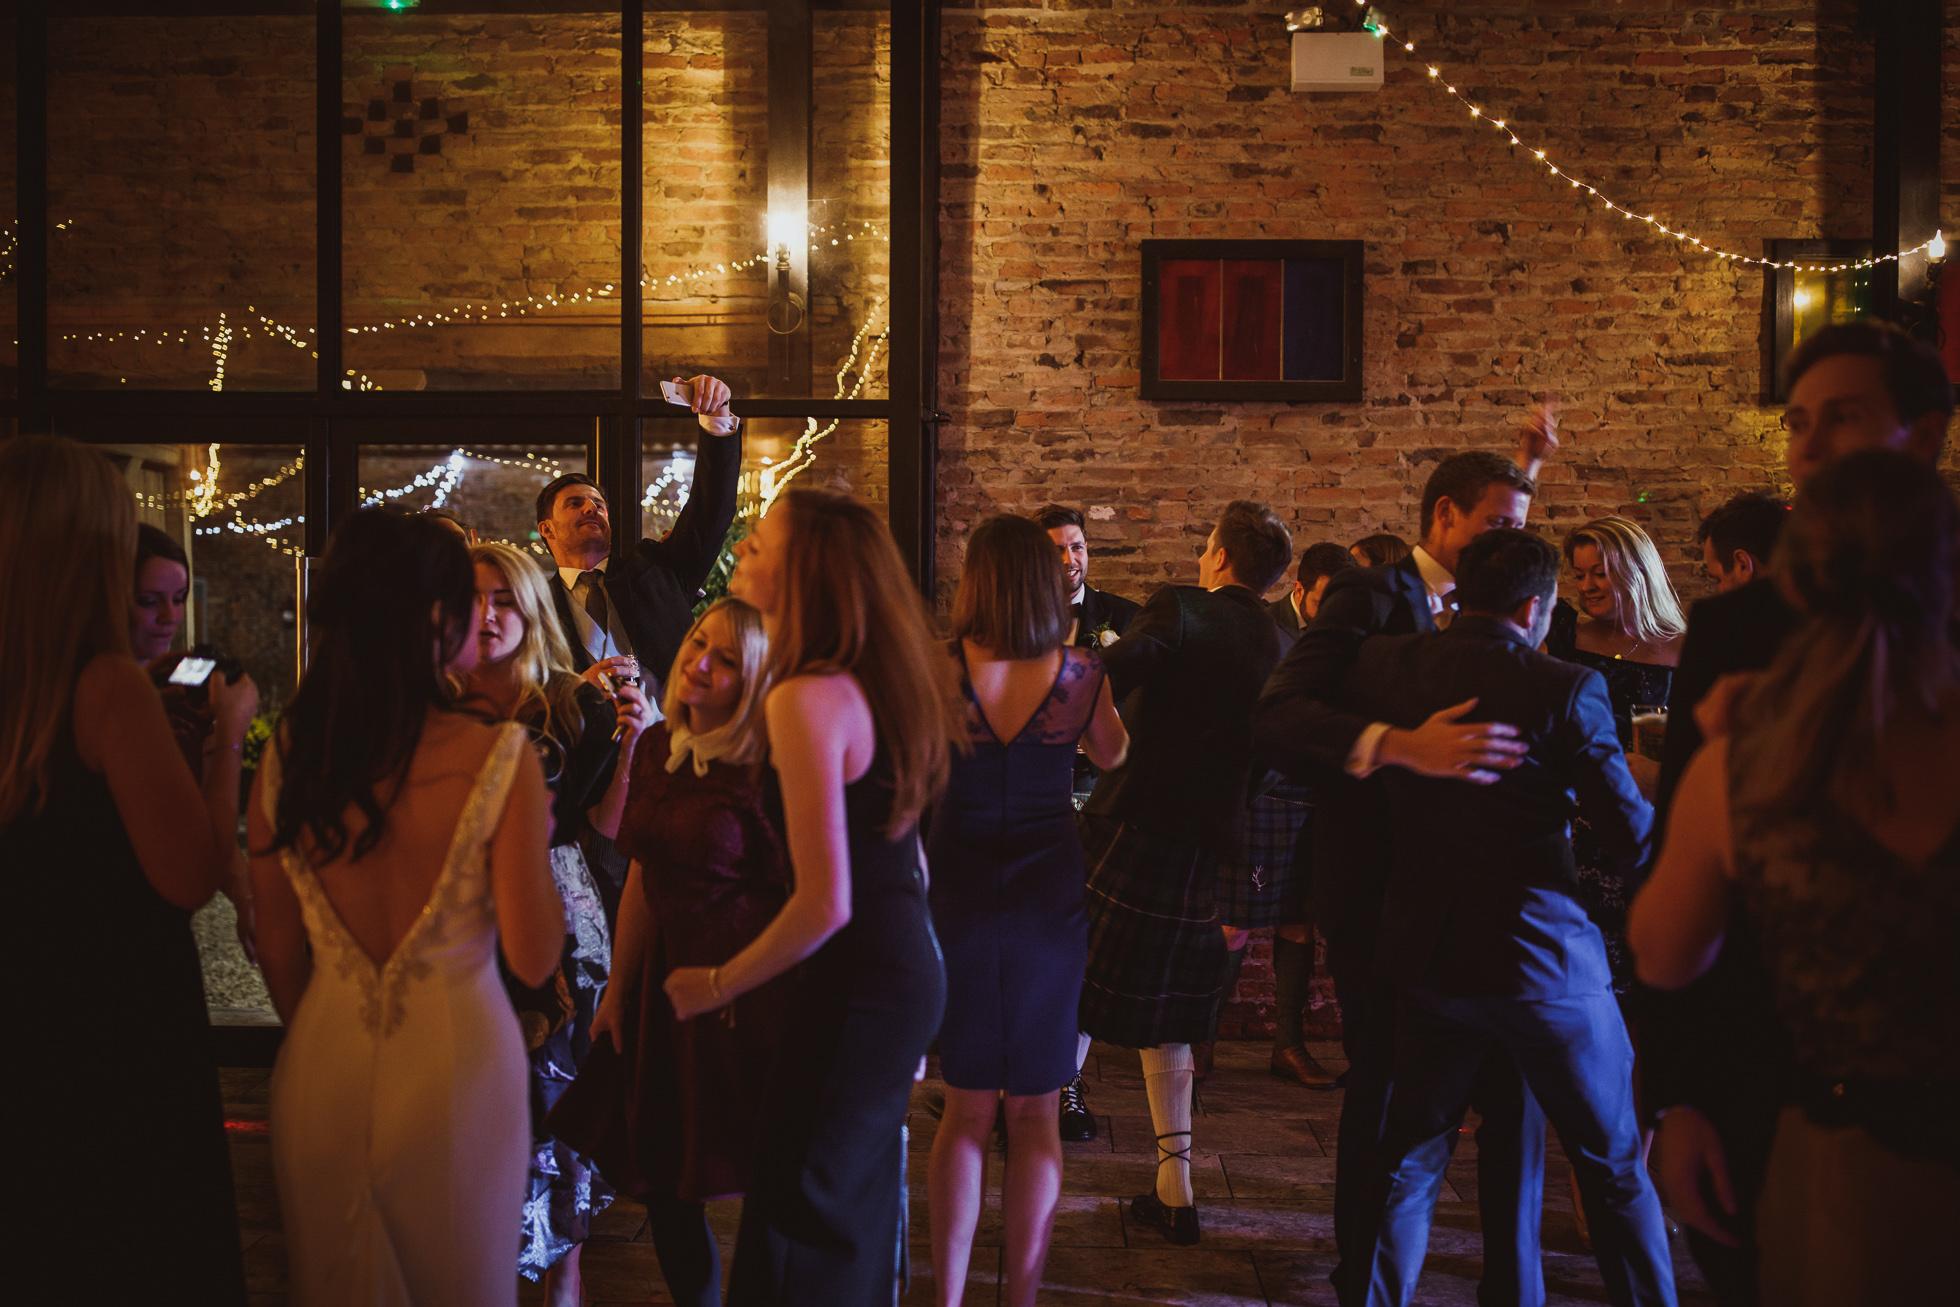 hornington_manor_wedding_photographer-145.jpg